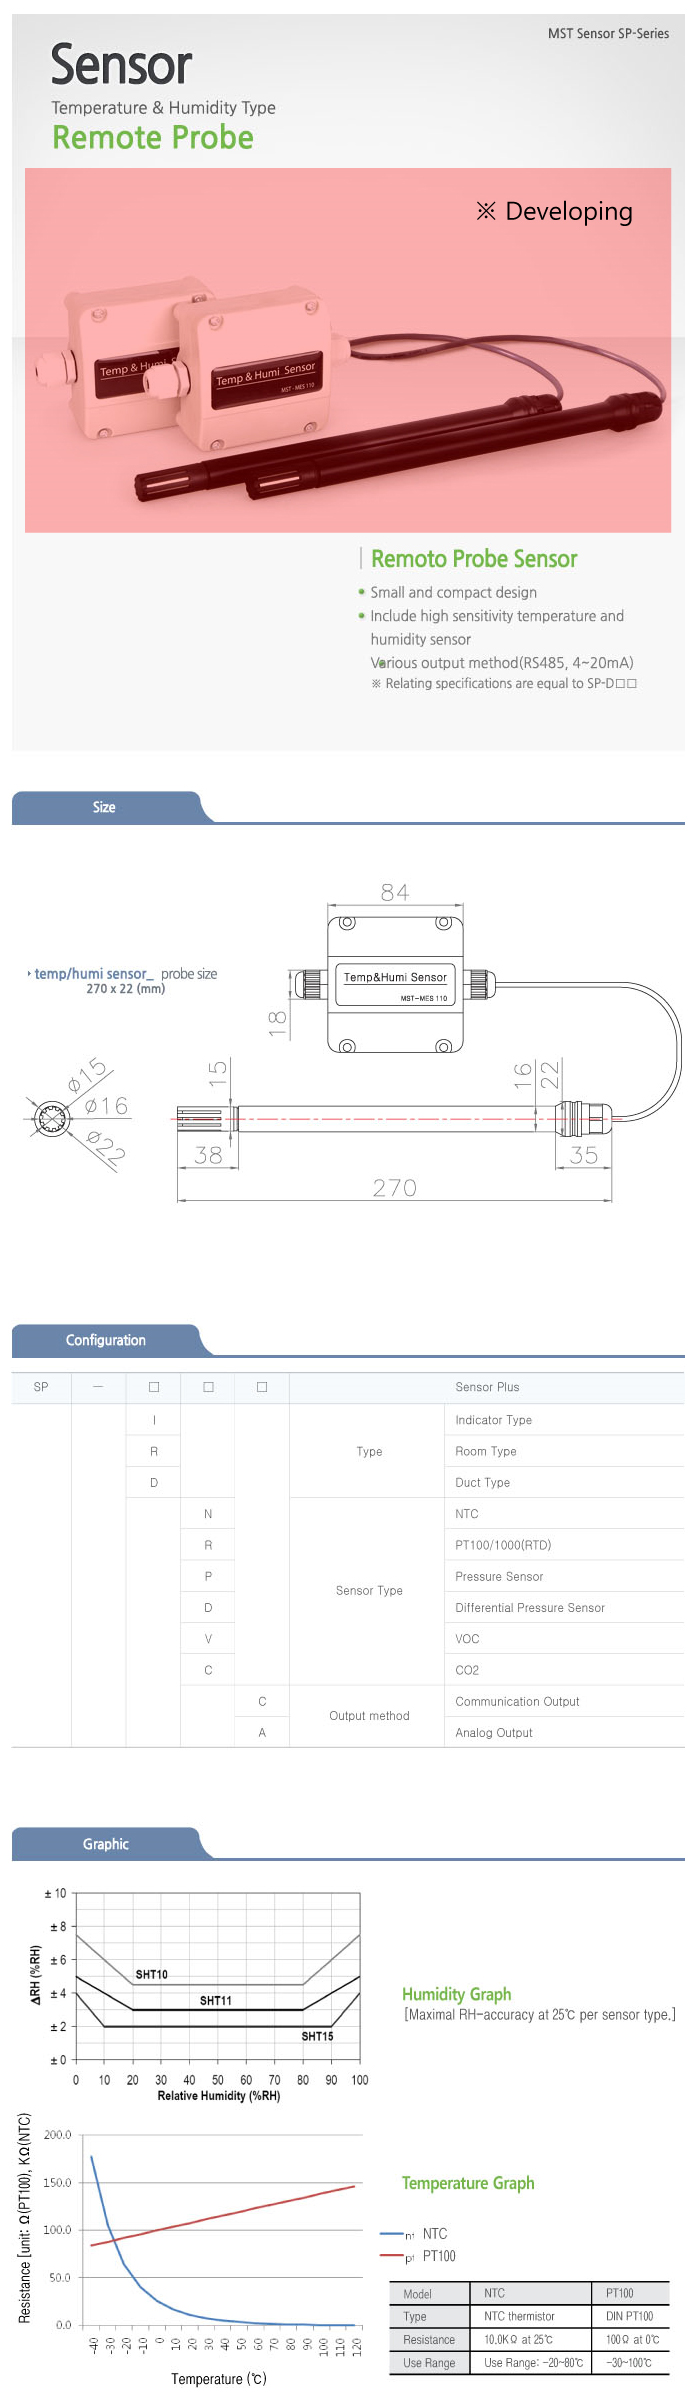 MST Temperature / Humidity Sensor (Remote Probe) SP Series